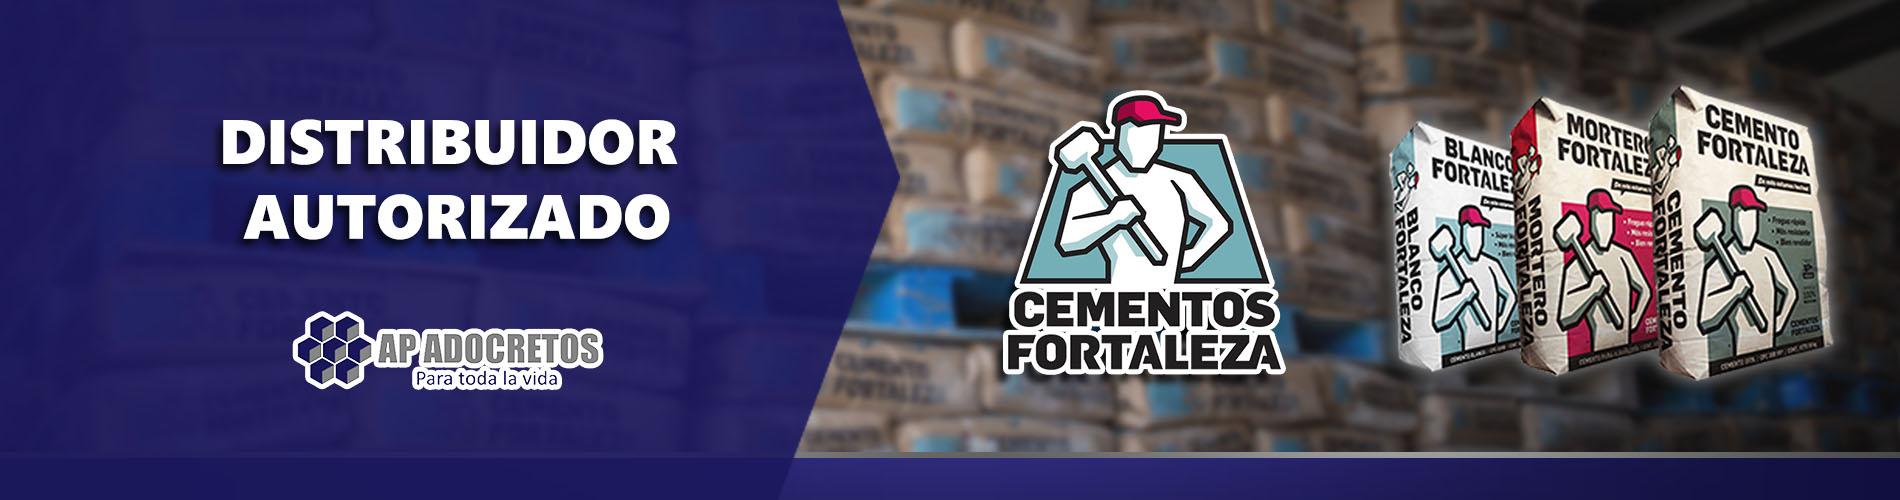 Banners_WEB_fortaleza_cemento